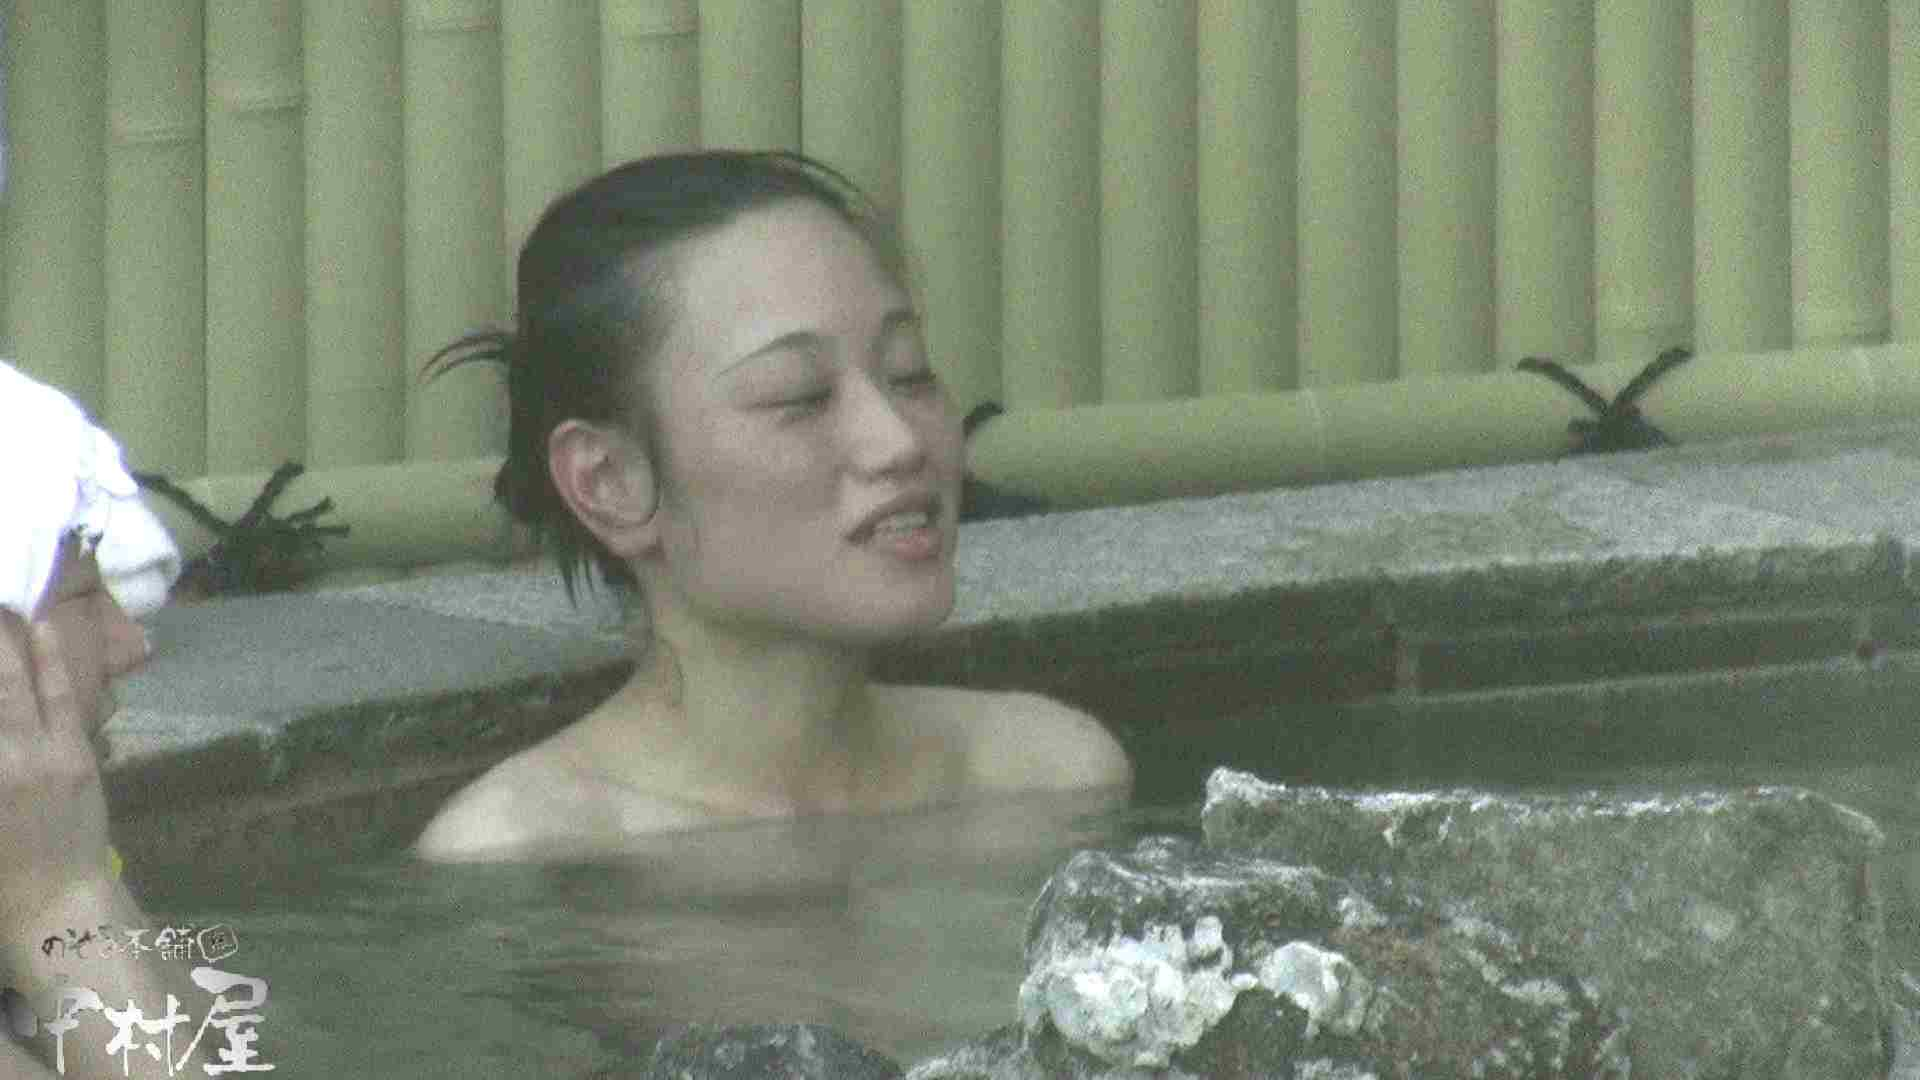 Aquaな露天風呂Vol.914 露天風呂編  83PIX 60